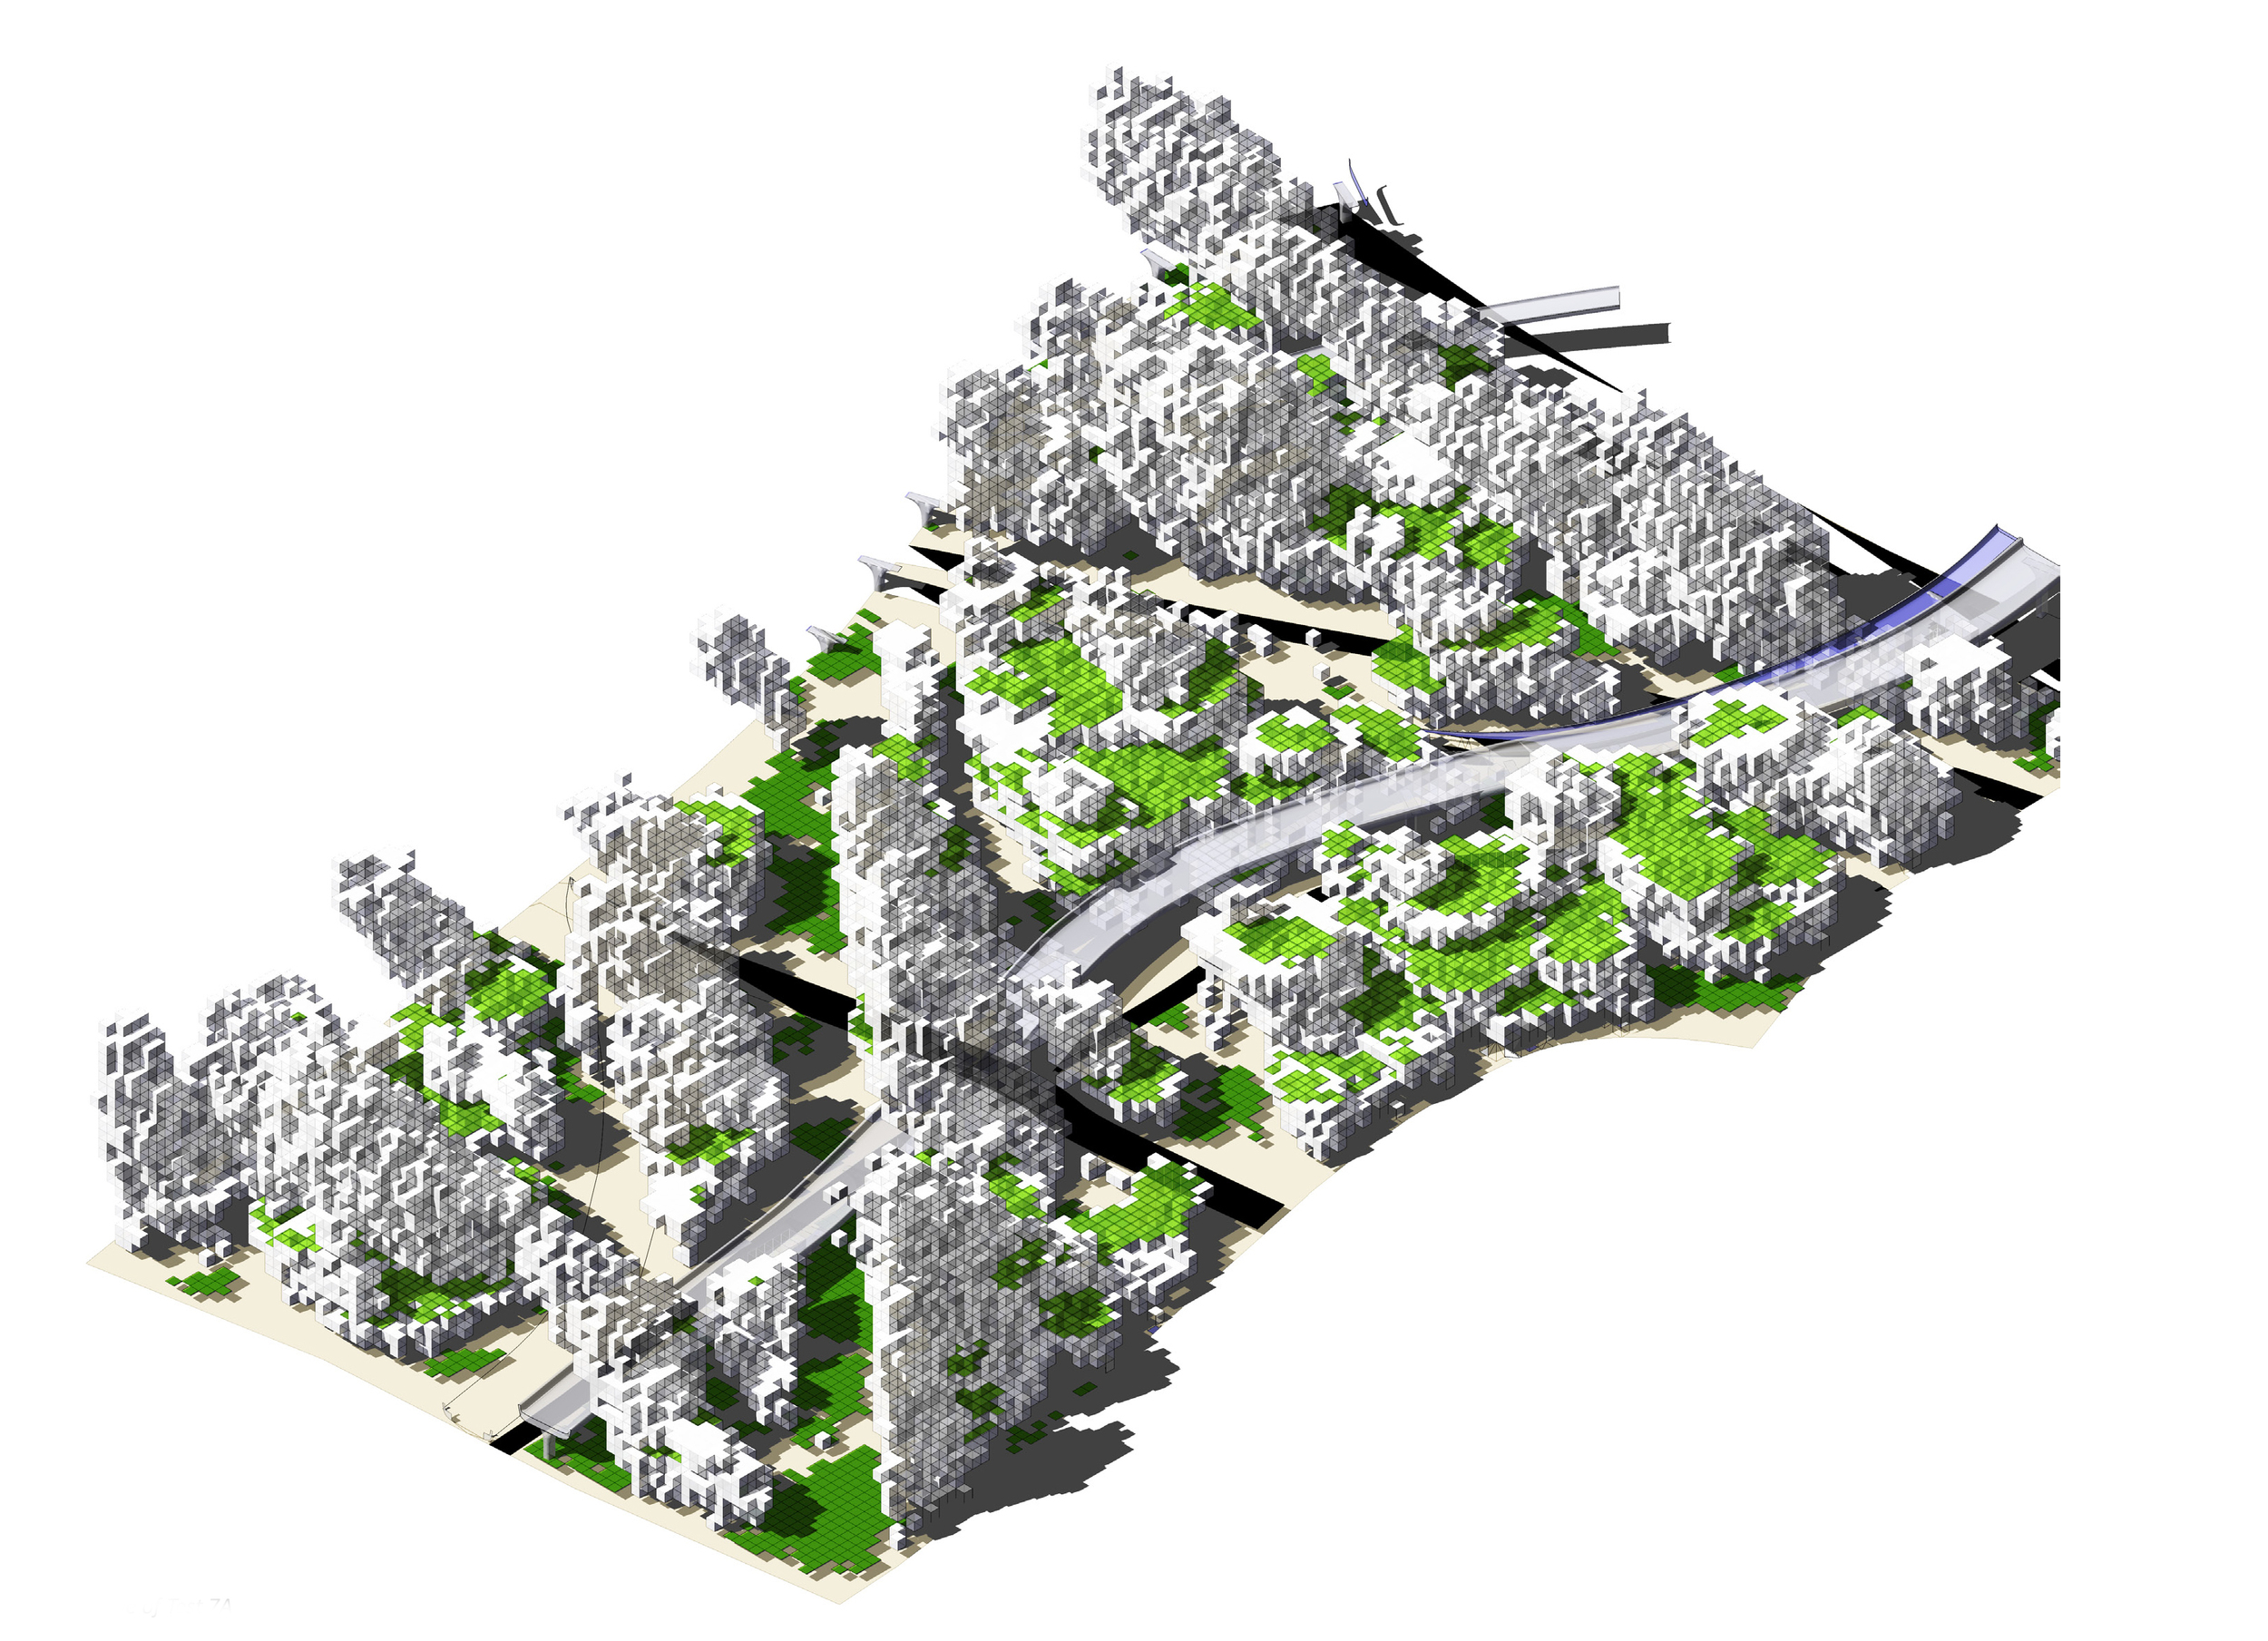 Concrete island - test01